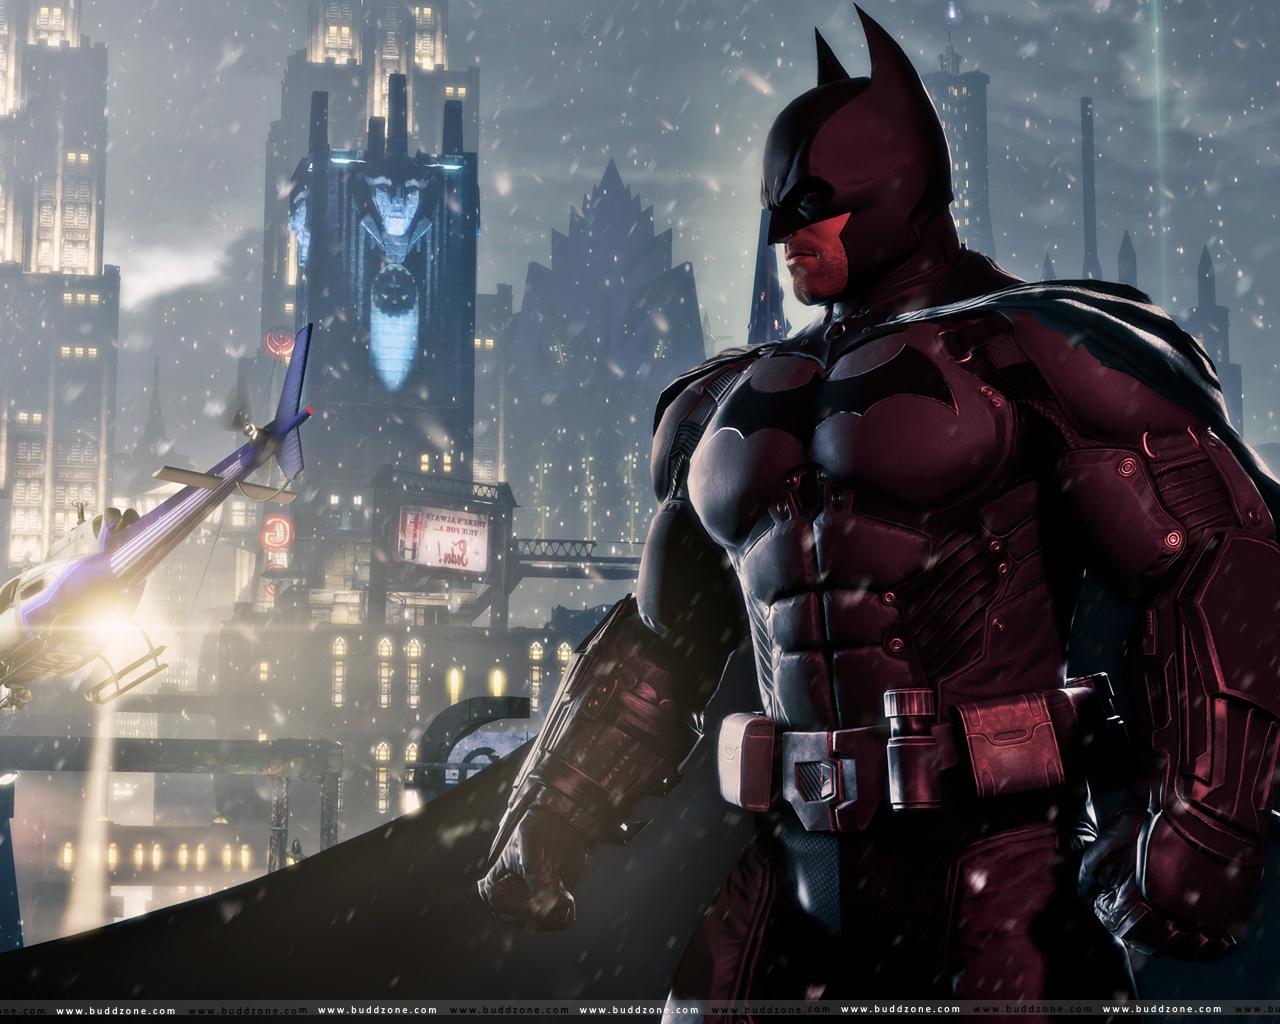 Wii U Games For Girls : Batman arkham origins free wallpapers download